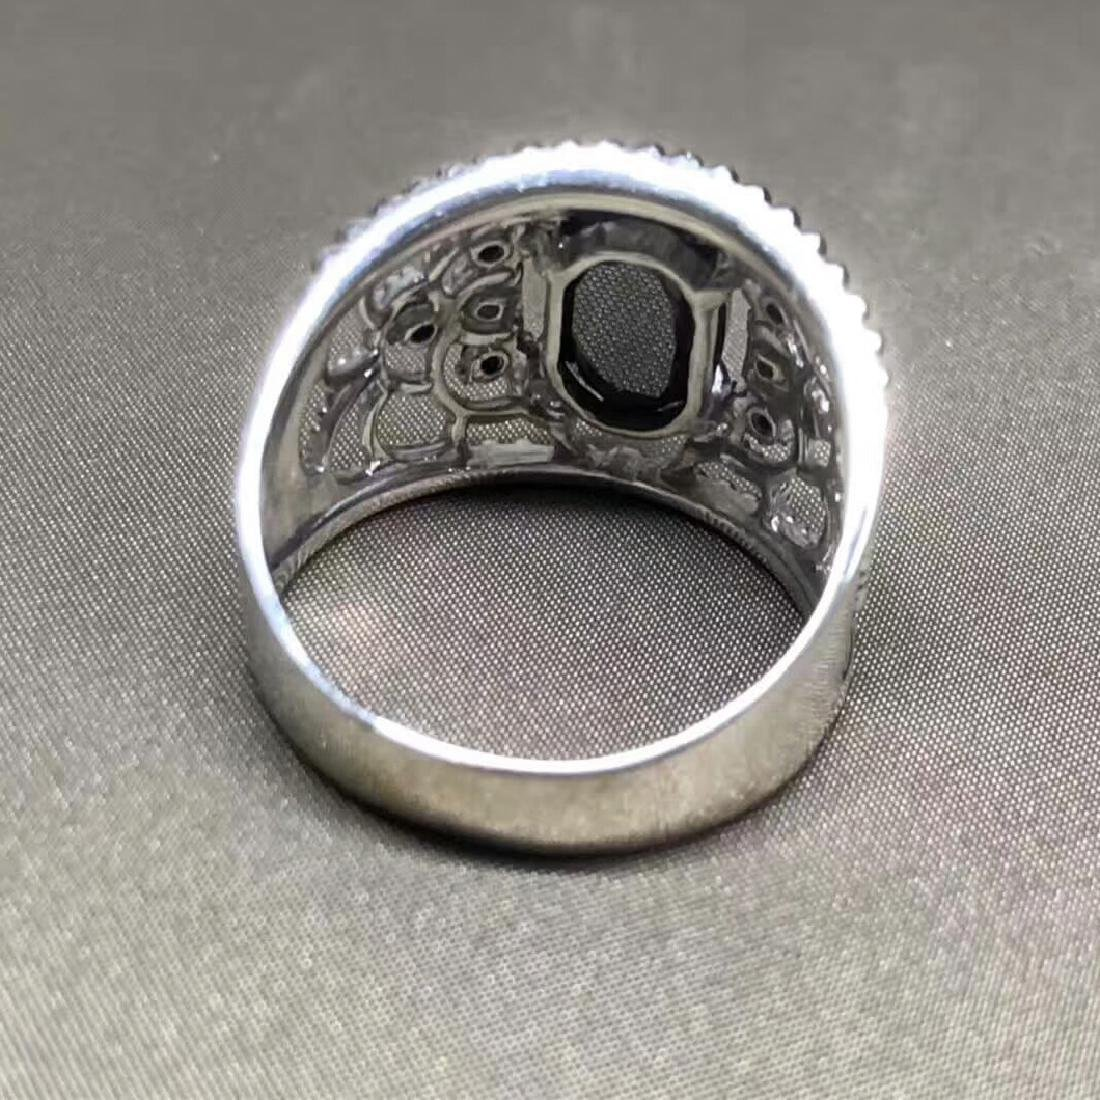 3.16ct Black Diamond Ring in 18kt White Gold - 6